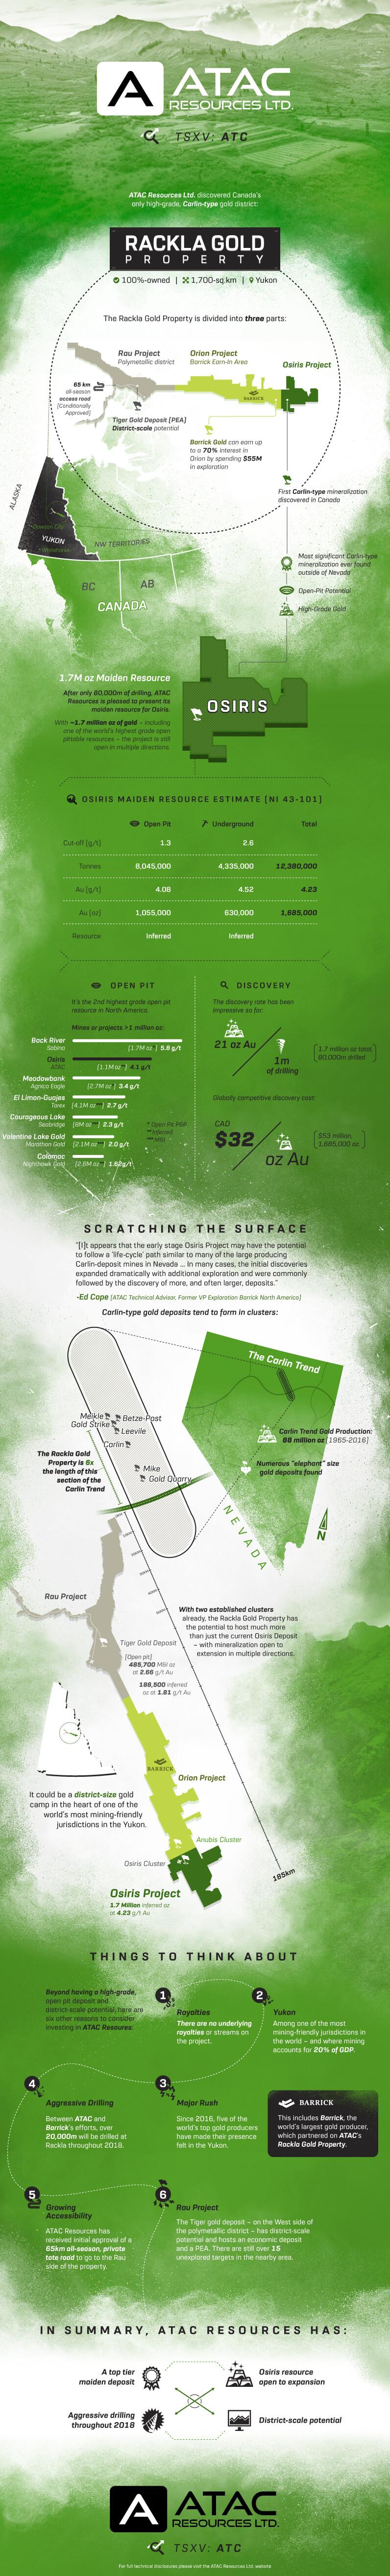 Visual Capitalist Infographic